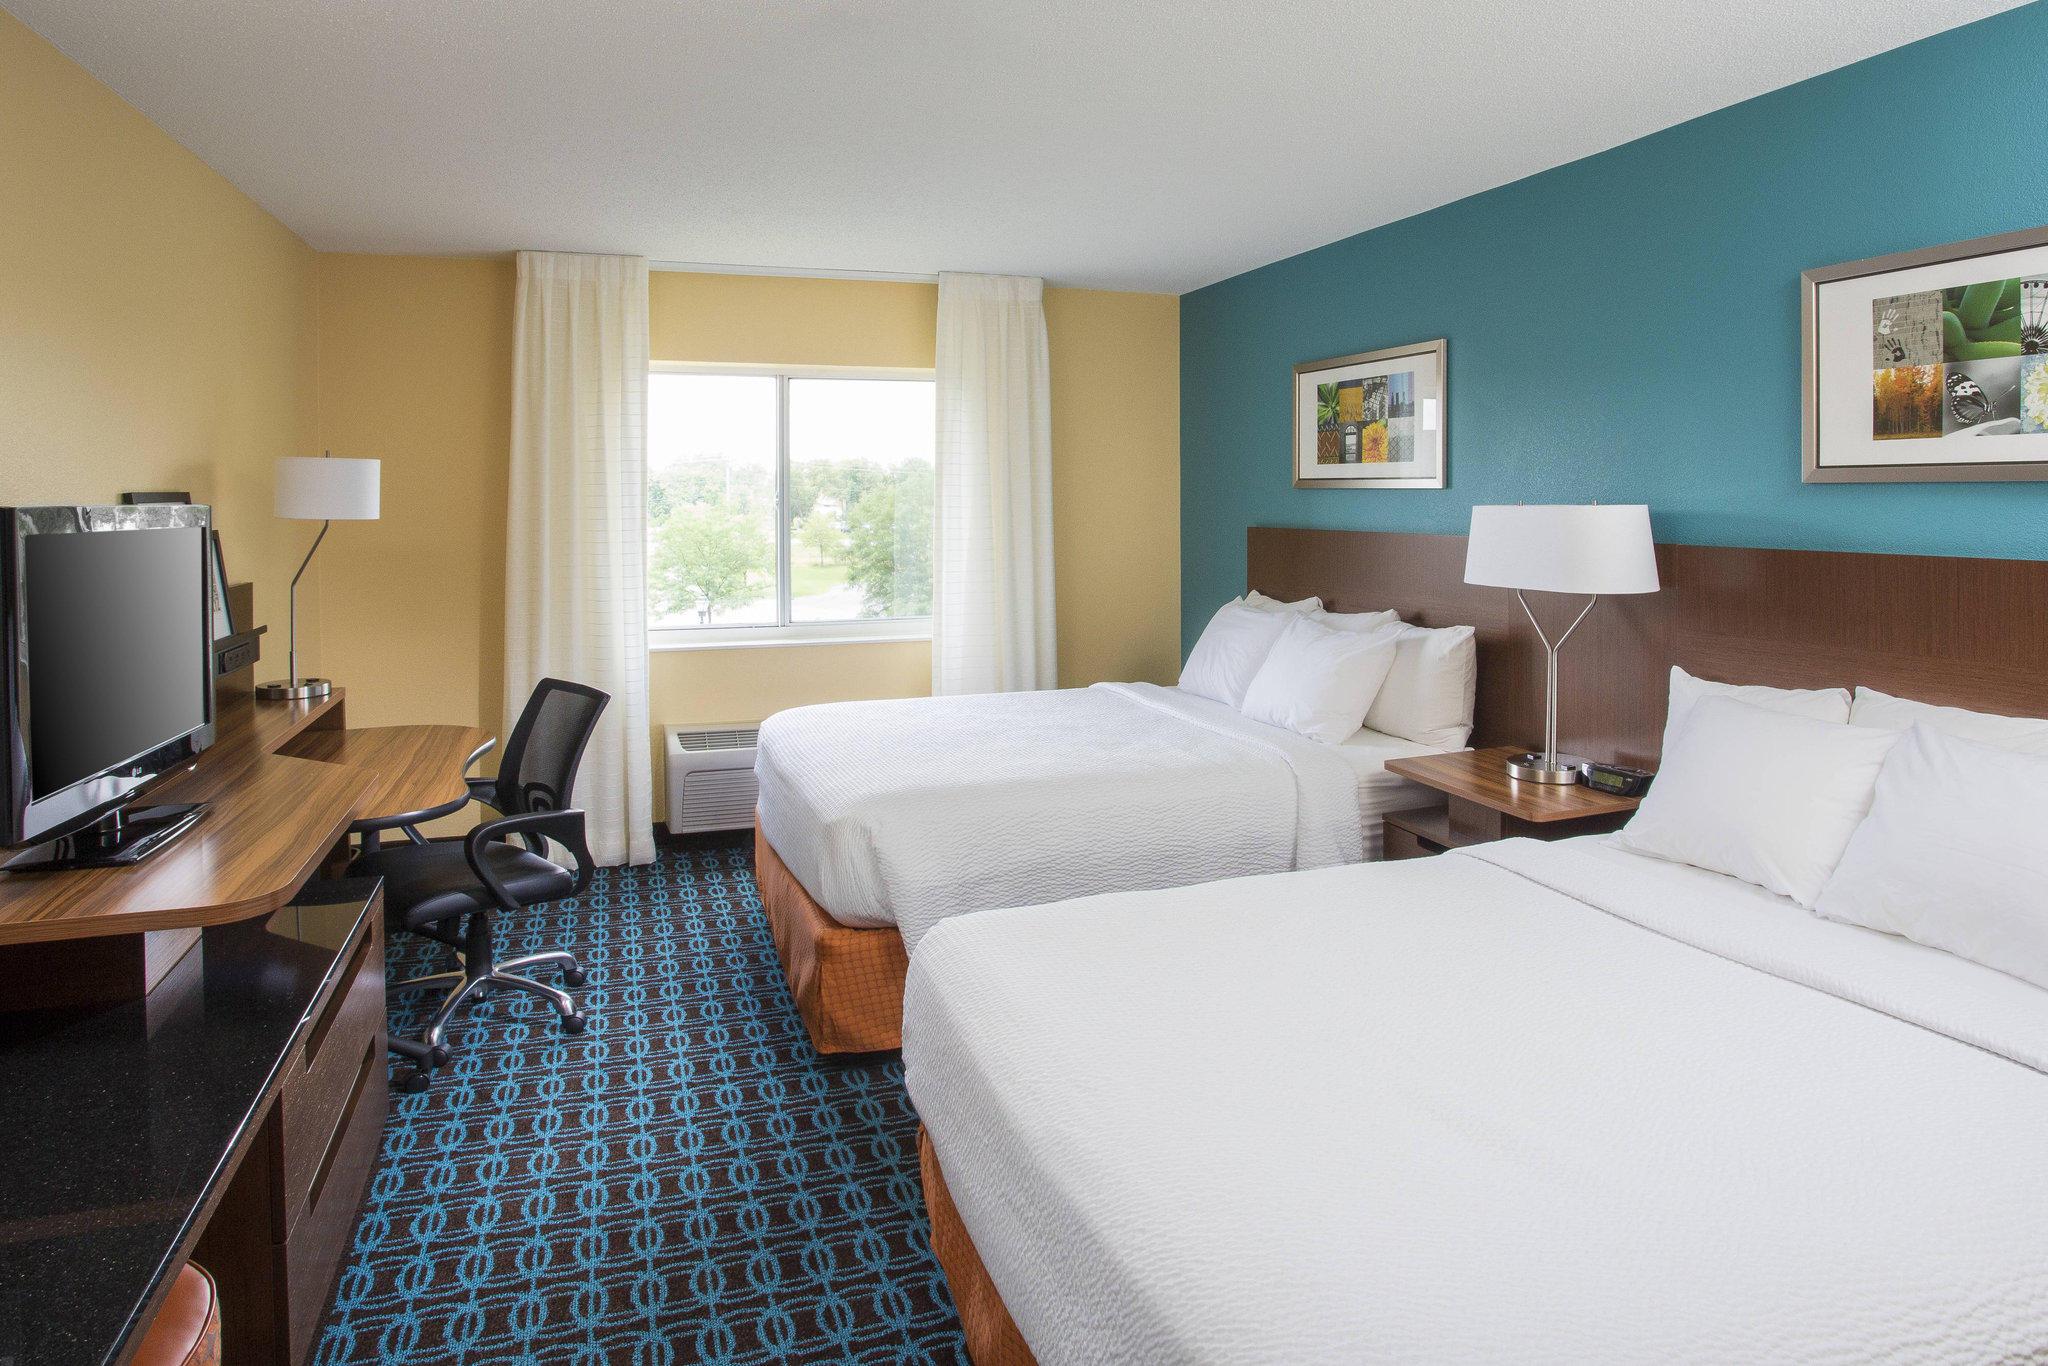 Fairfield Inn & Suites by Marriott South Bend Mishawaka